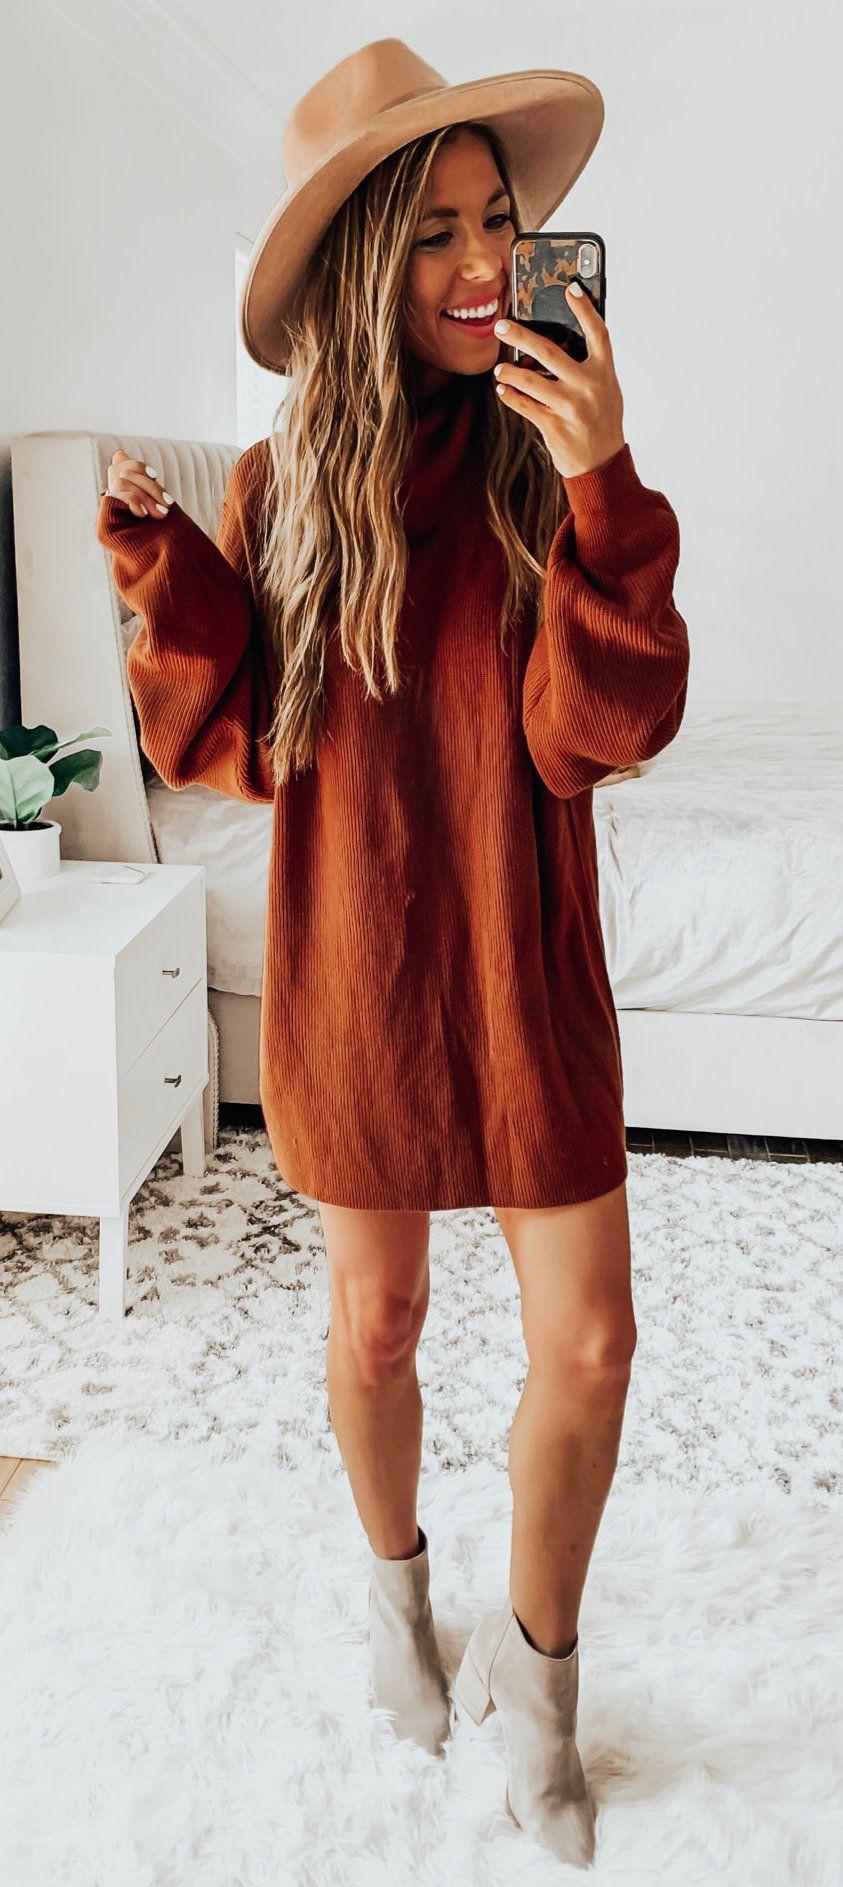 Cute Outfit Ideas For Teenage Girl, Moda & moda